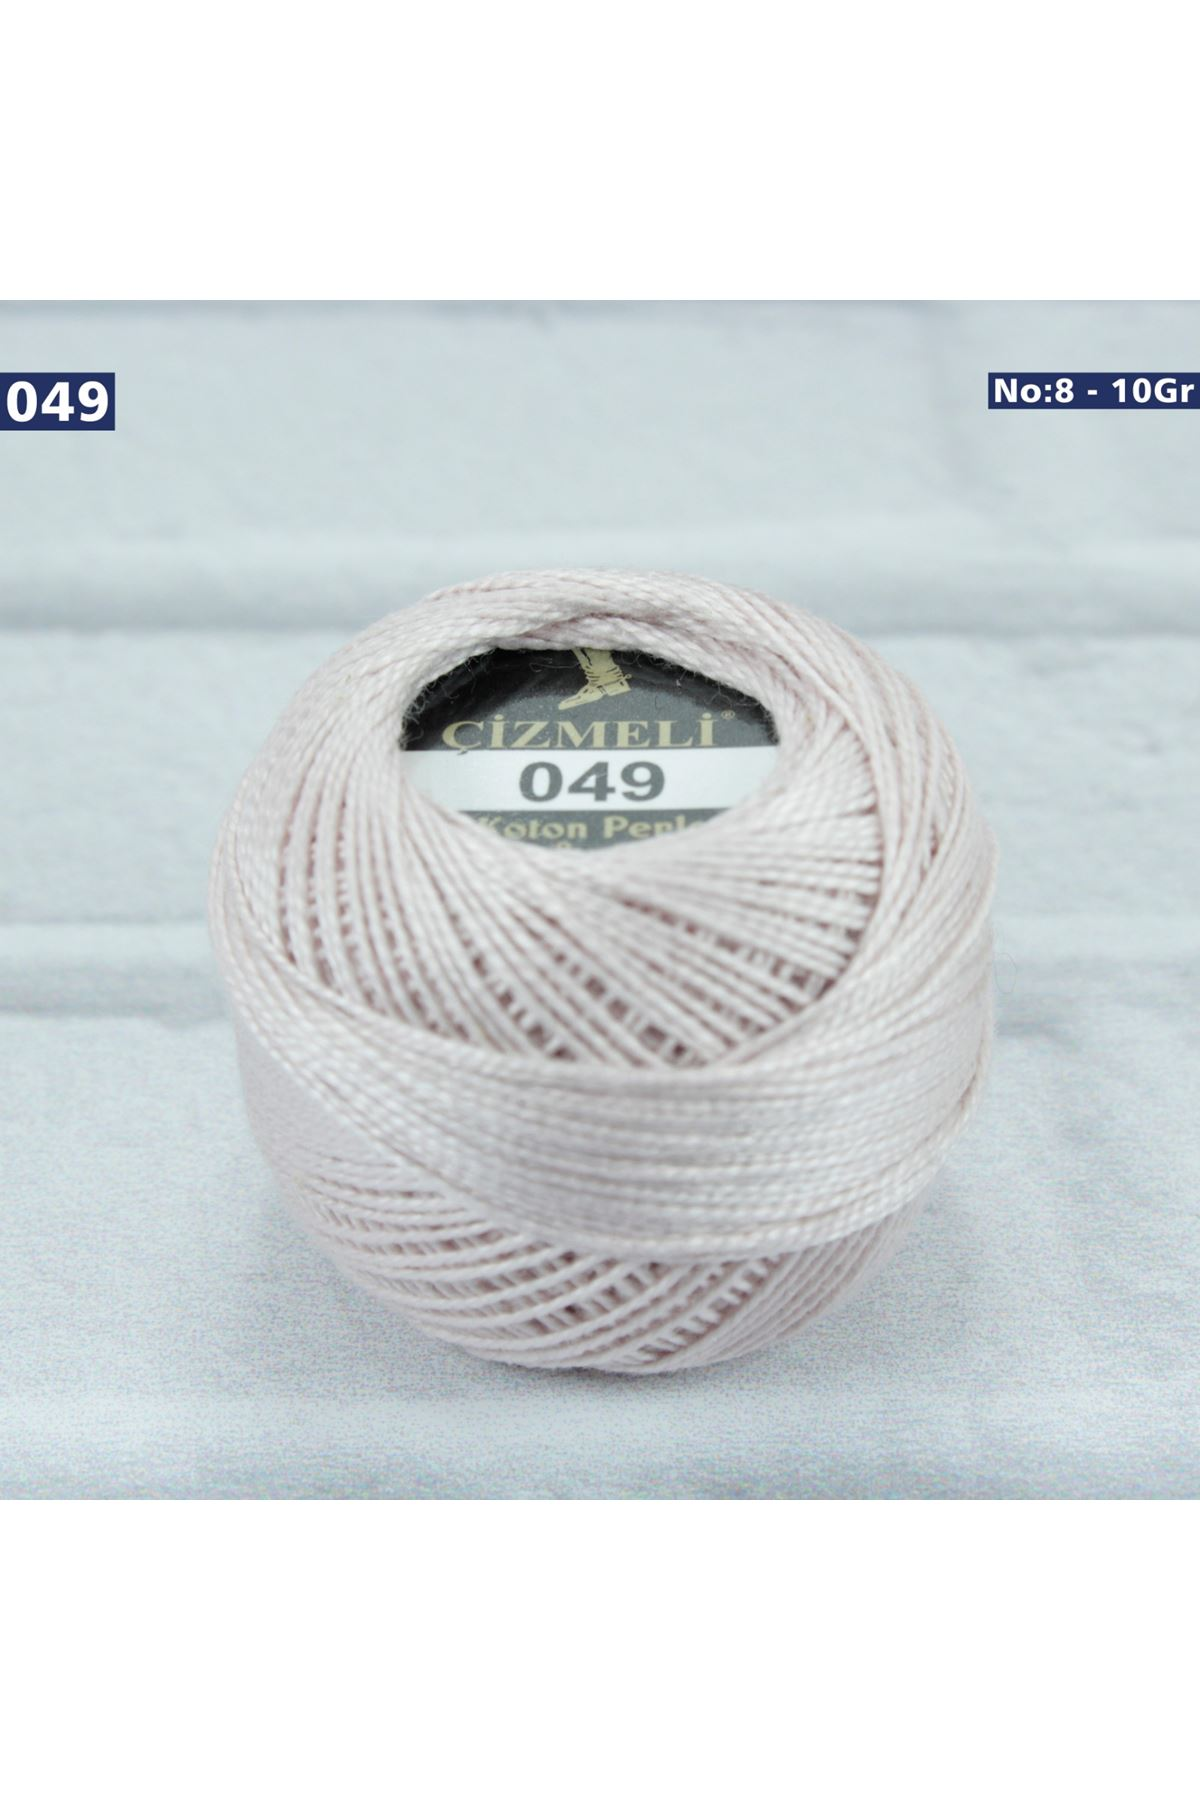 Çizmeli Cotton Perle Nakış İpliği No: 049